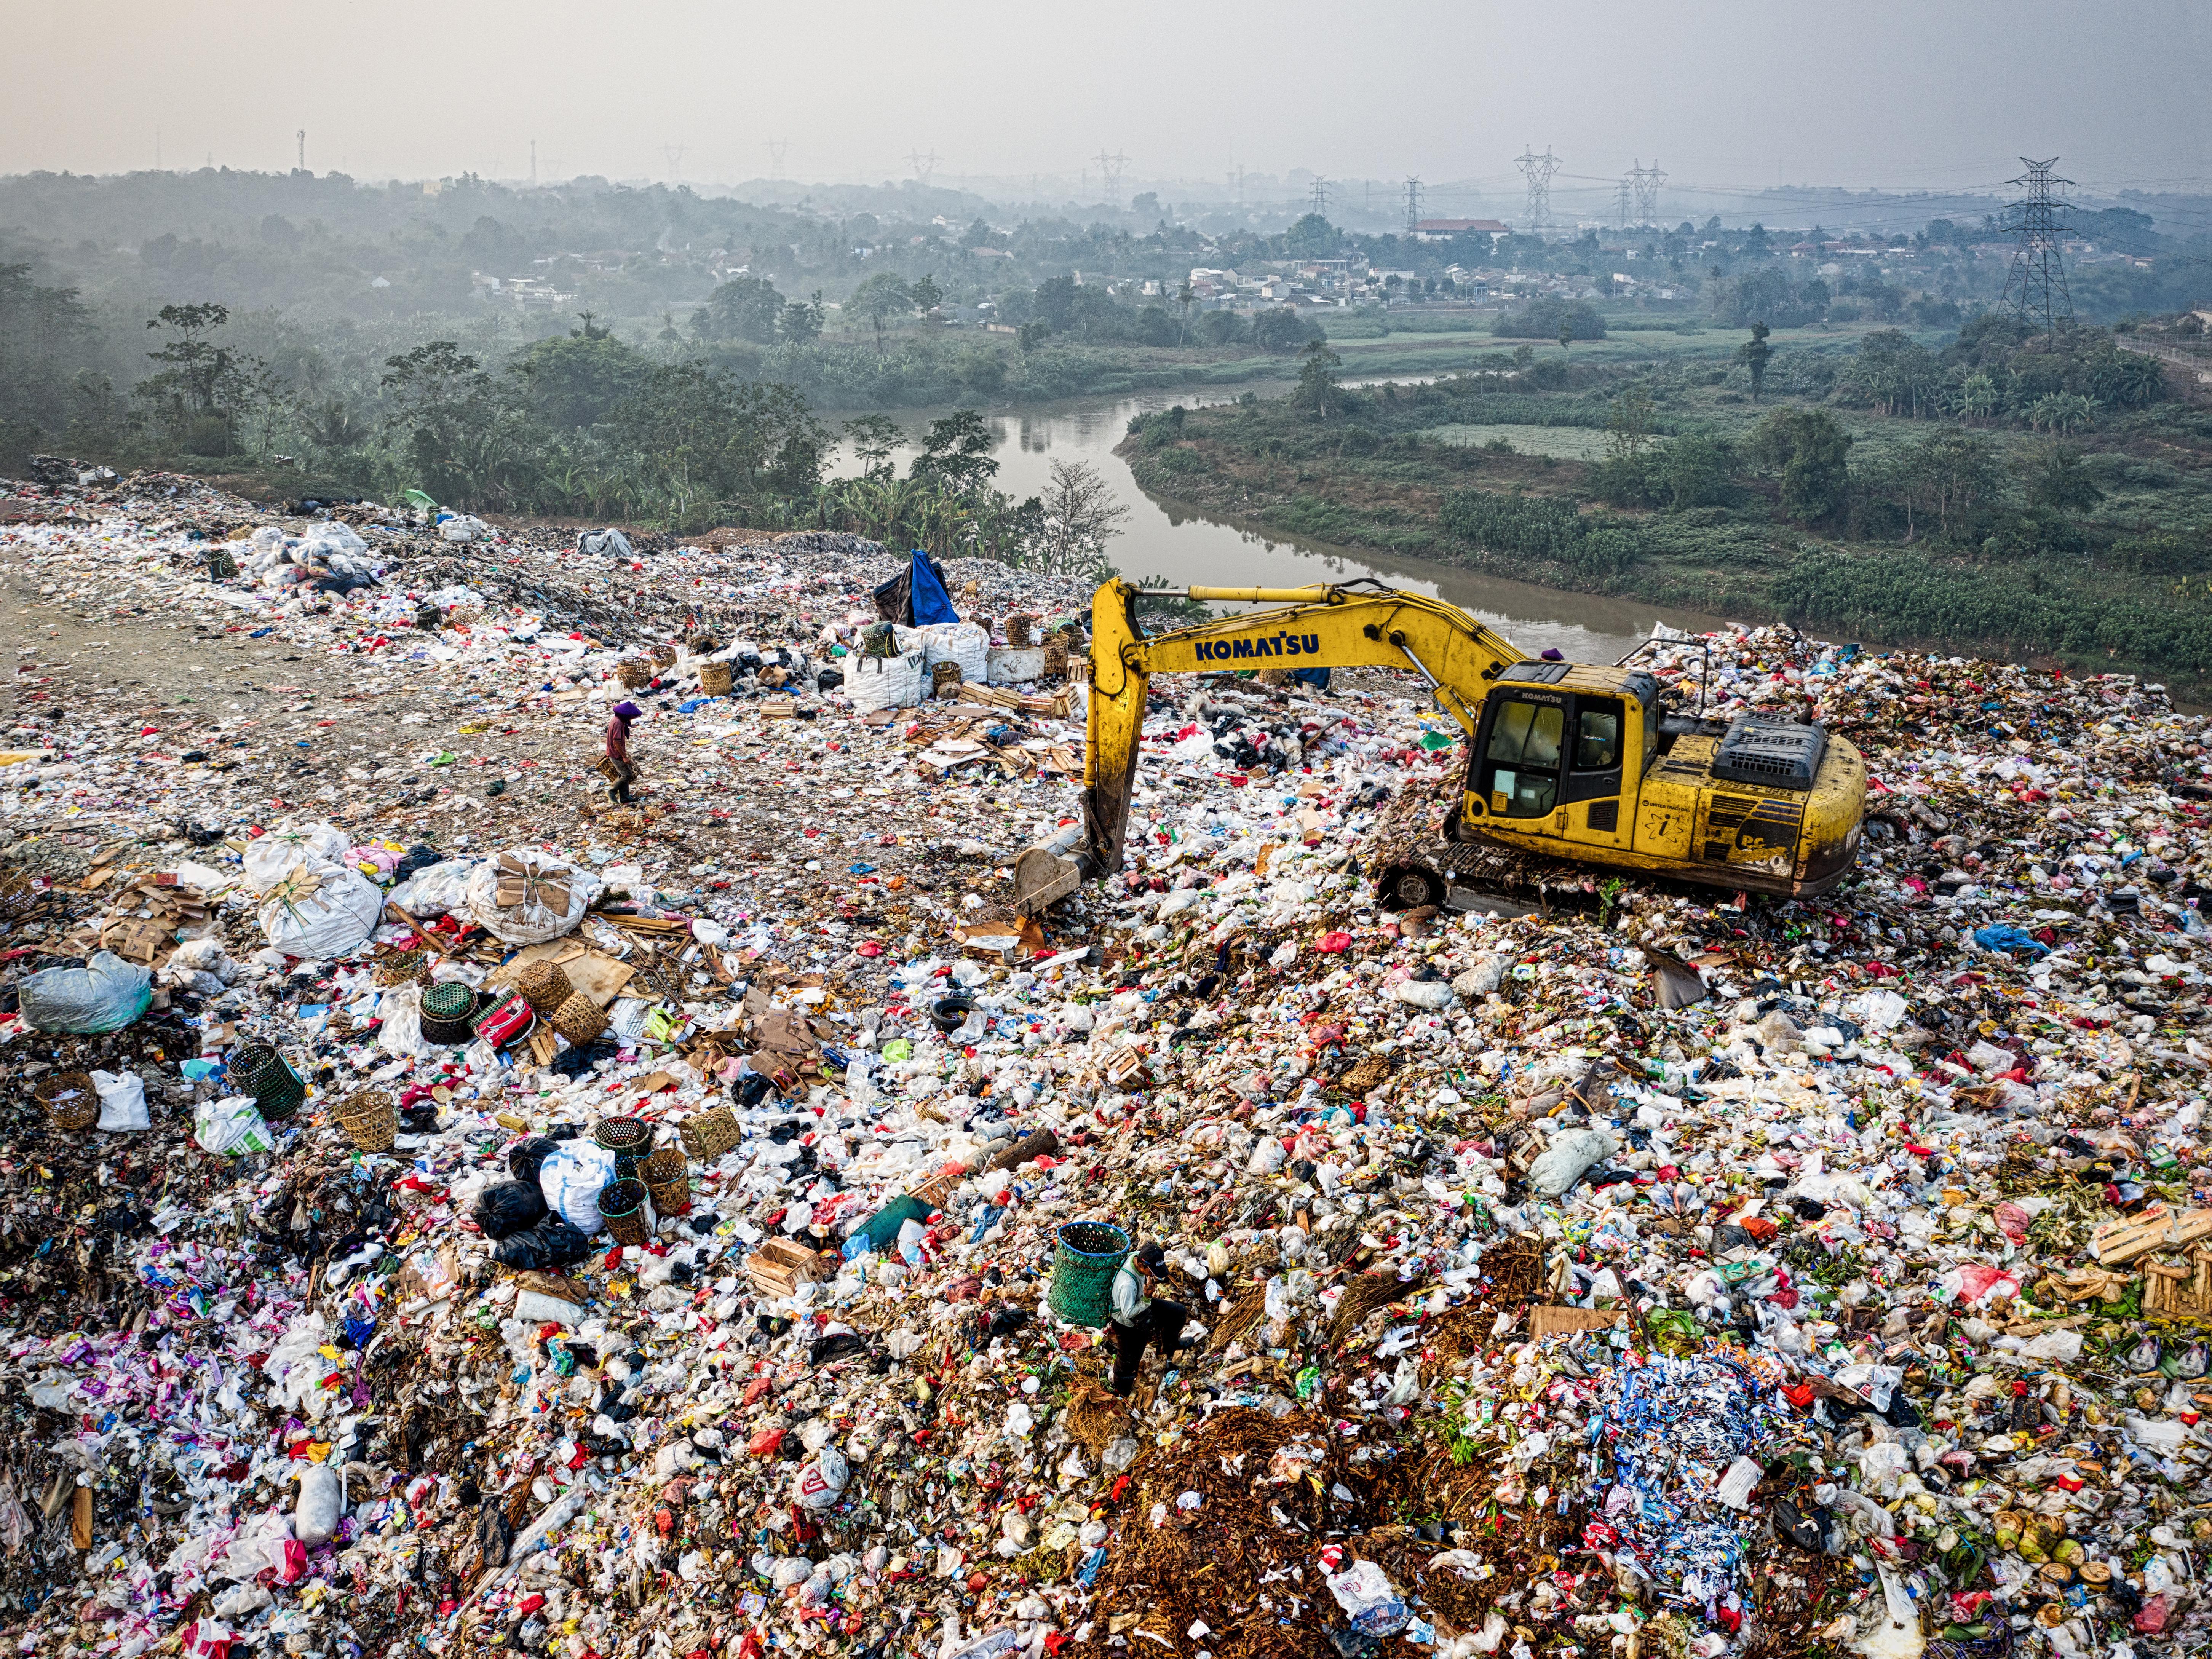 Local Hazards Grow as States Ship Garbage Overflow